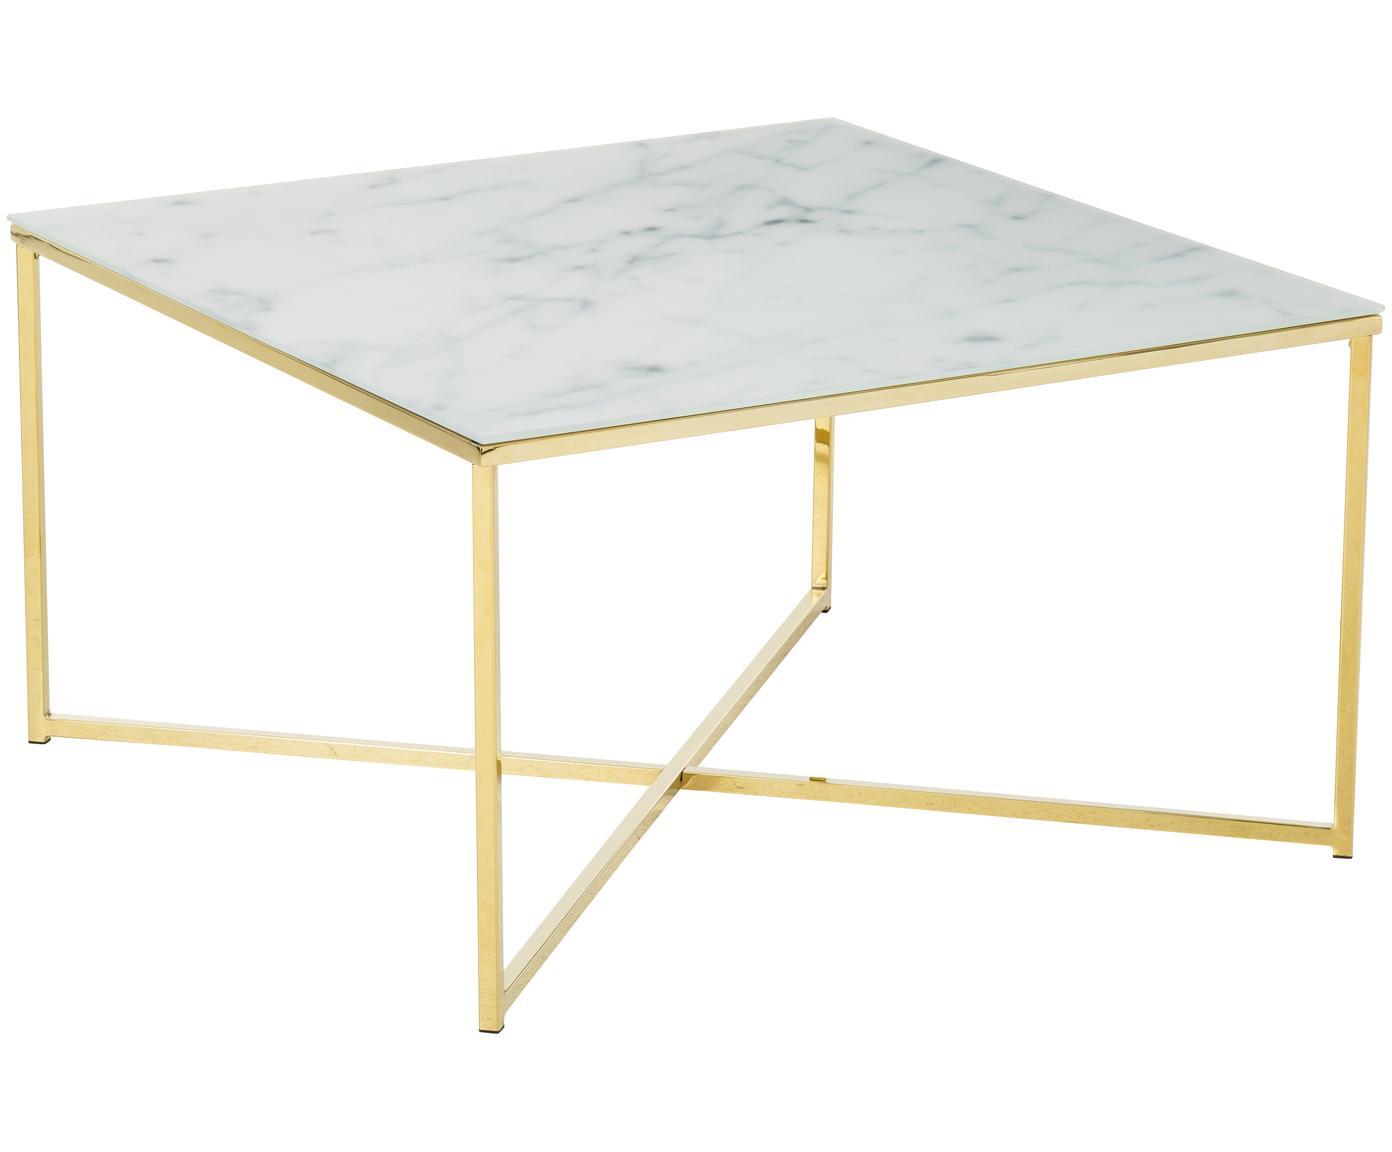 Mesa de centro Antigua, tablero de cristal en aspecto mármol, Tablero: vidrio laminado estampado, Estructura: acero, latón, Blanco, latón, An 80 x Al 45 cm